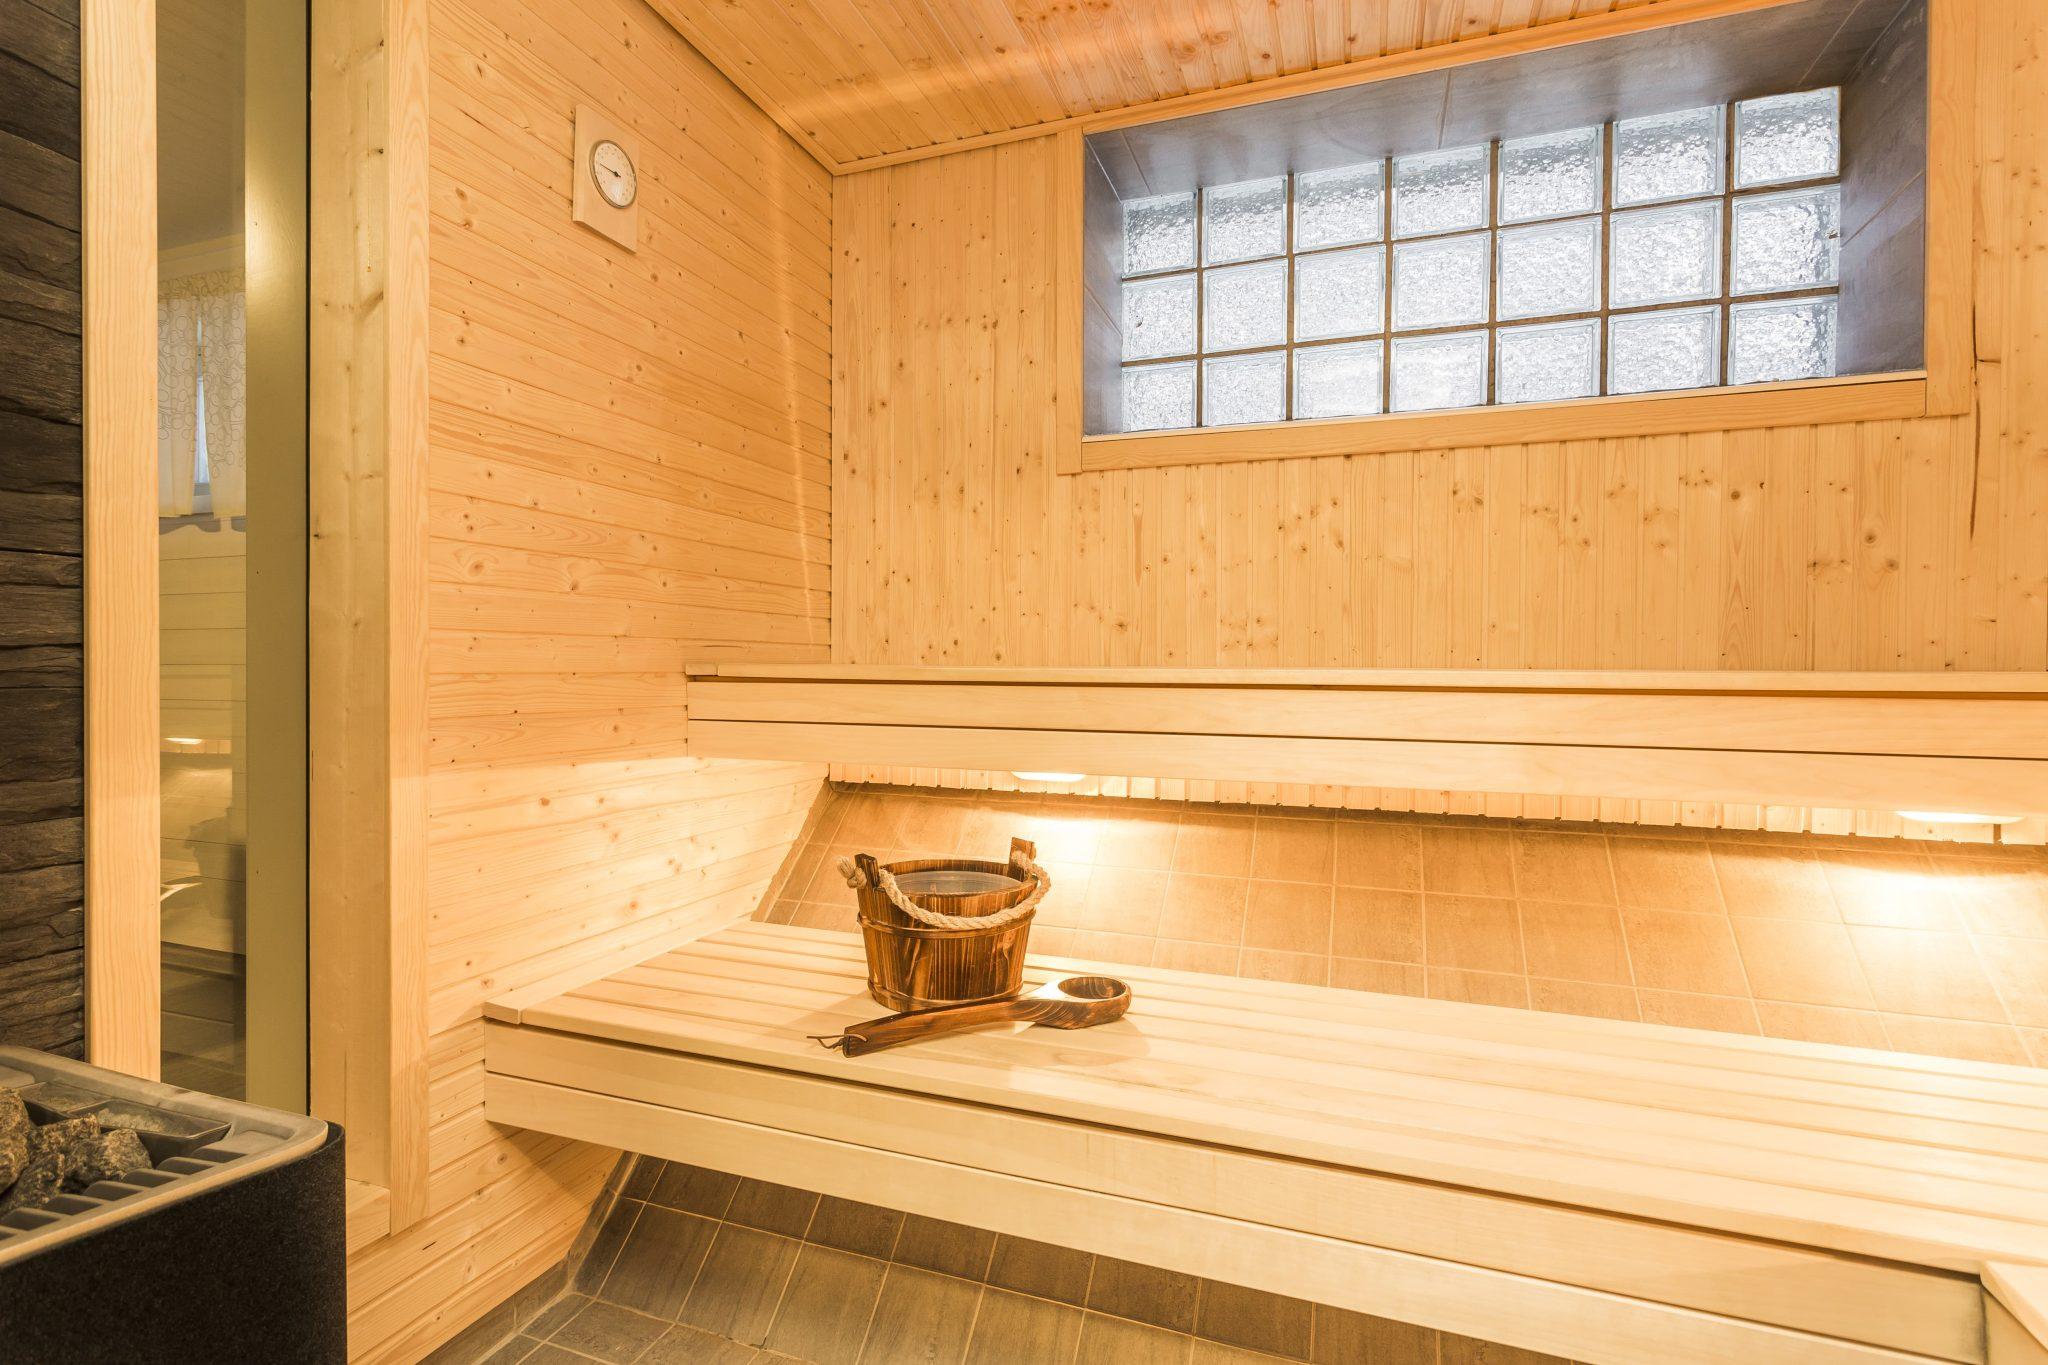 How to build a sauna